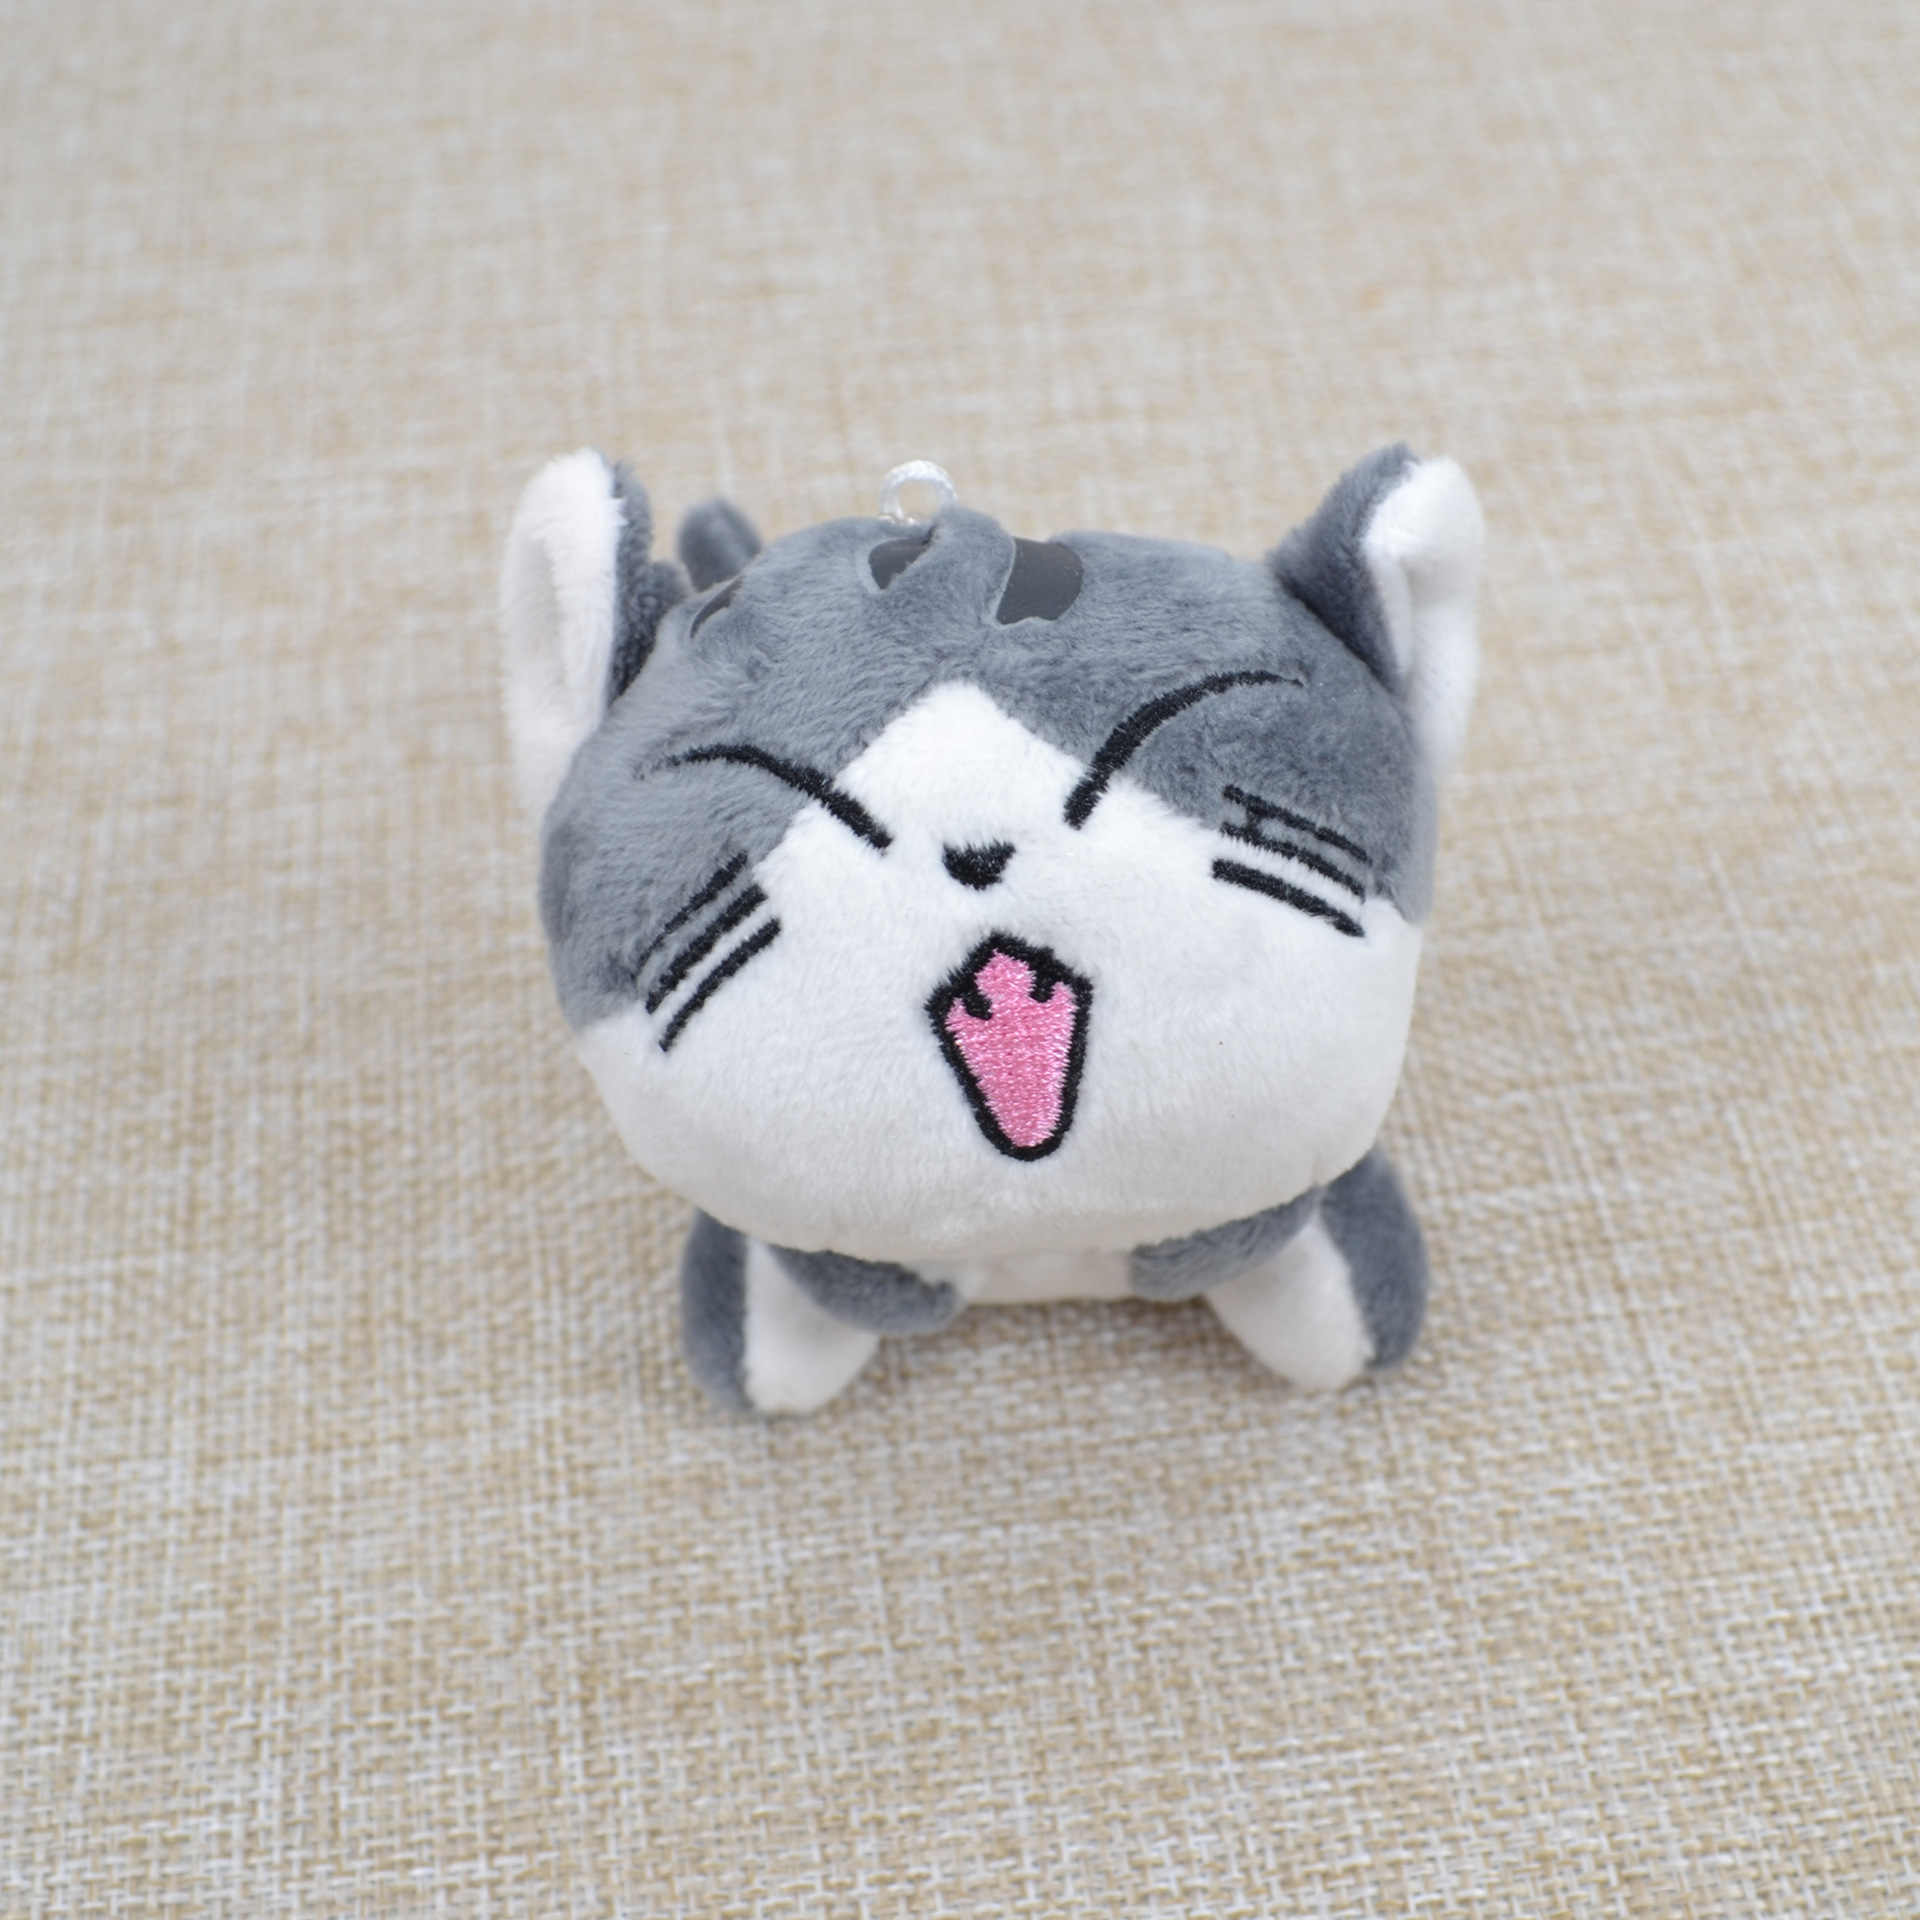 9 cm kawaii macio de pelúcia gato boneca gato chaveiro cinza sentado gato pelúcia brinquedos buquê presente de pelúcia brinquedo de pelúcia boneca de gato de flor presente